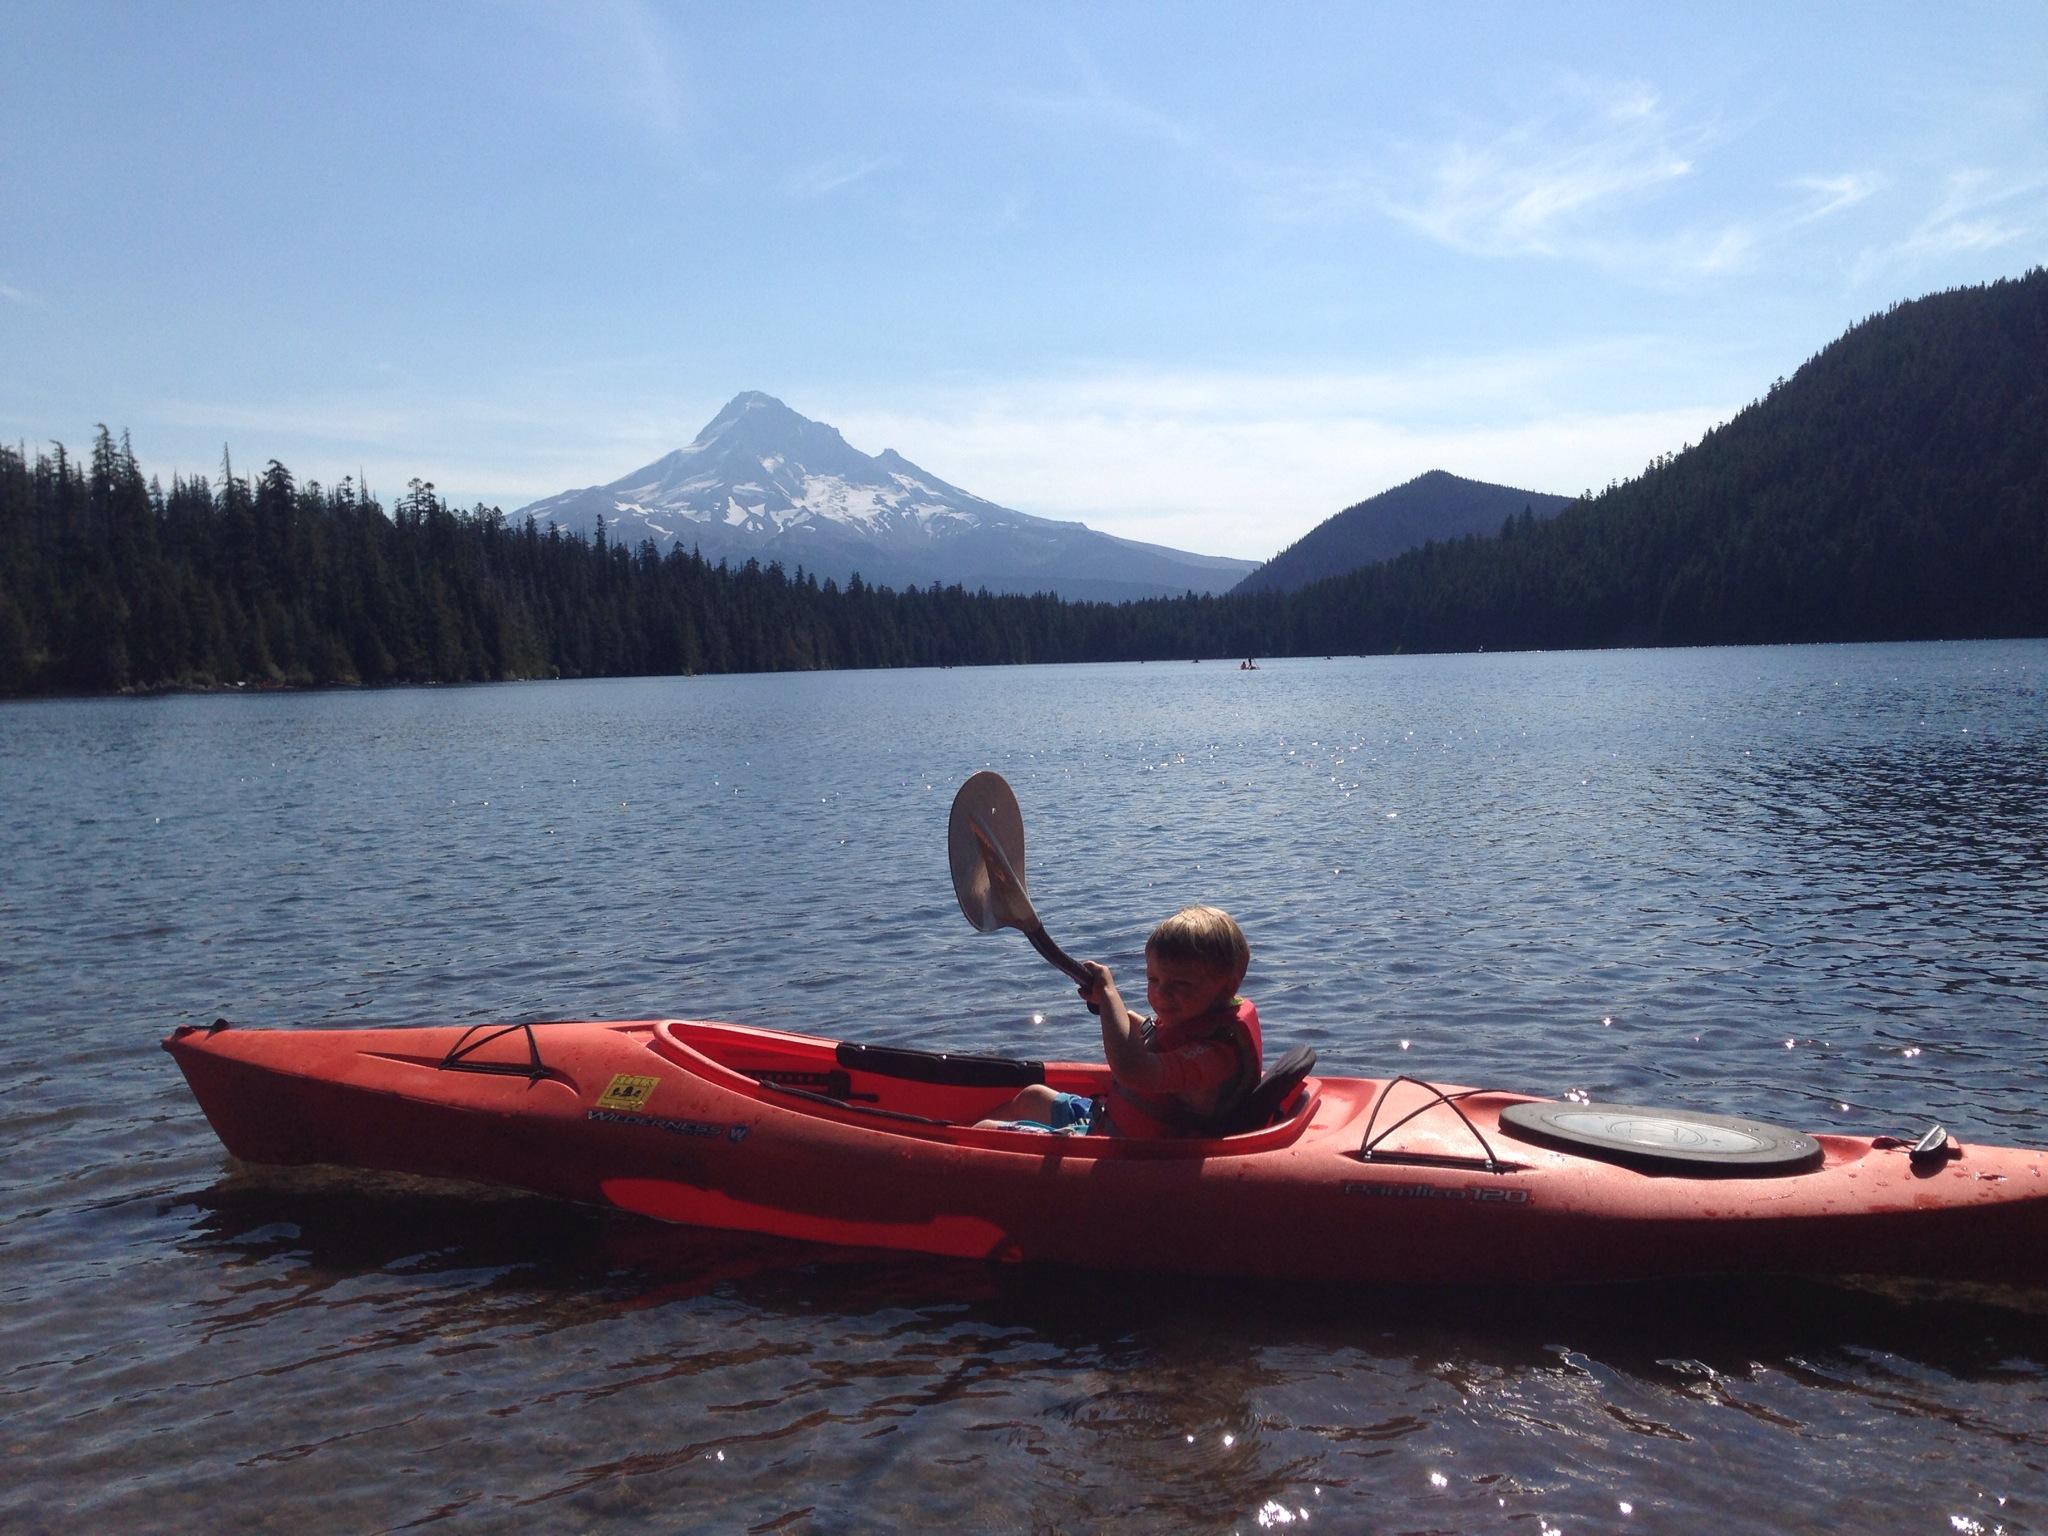 f1b7cb1a2d6 lakes | On MOUNT HOOD